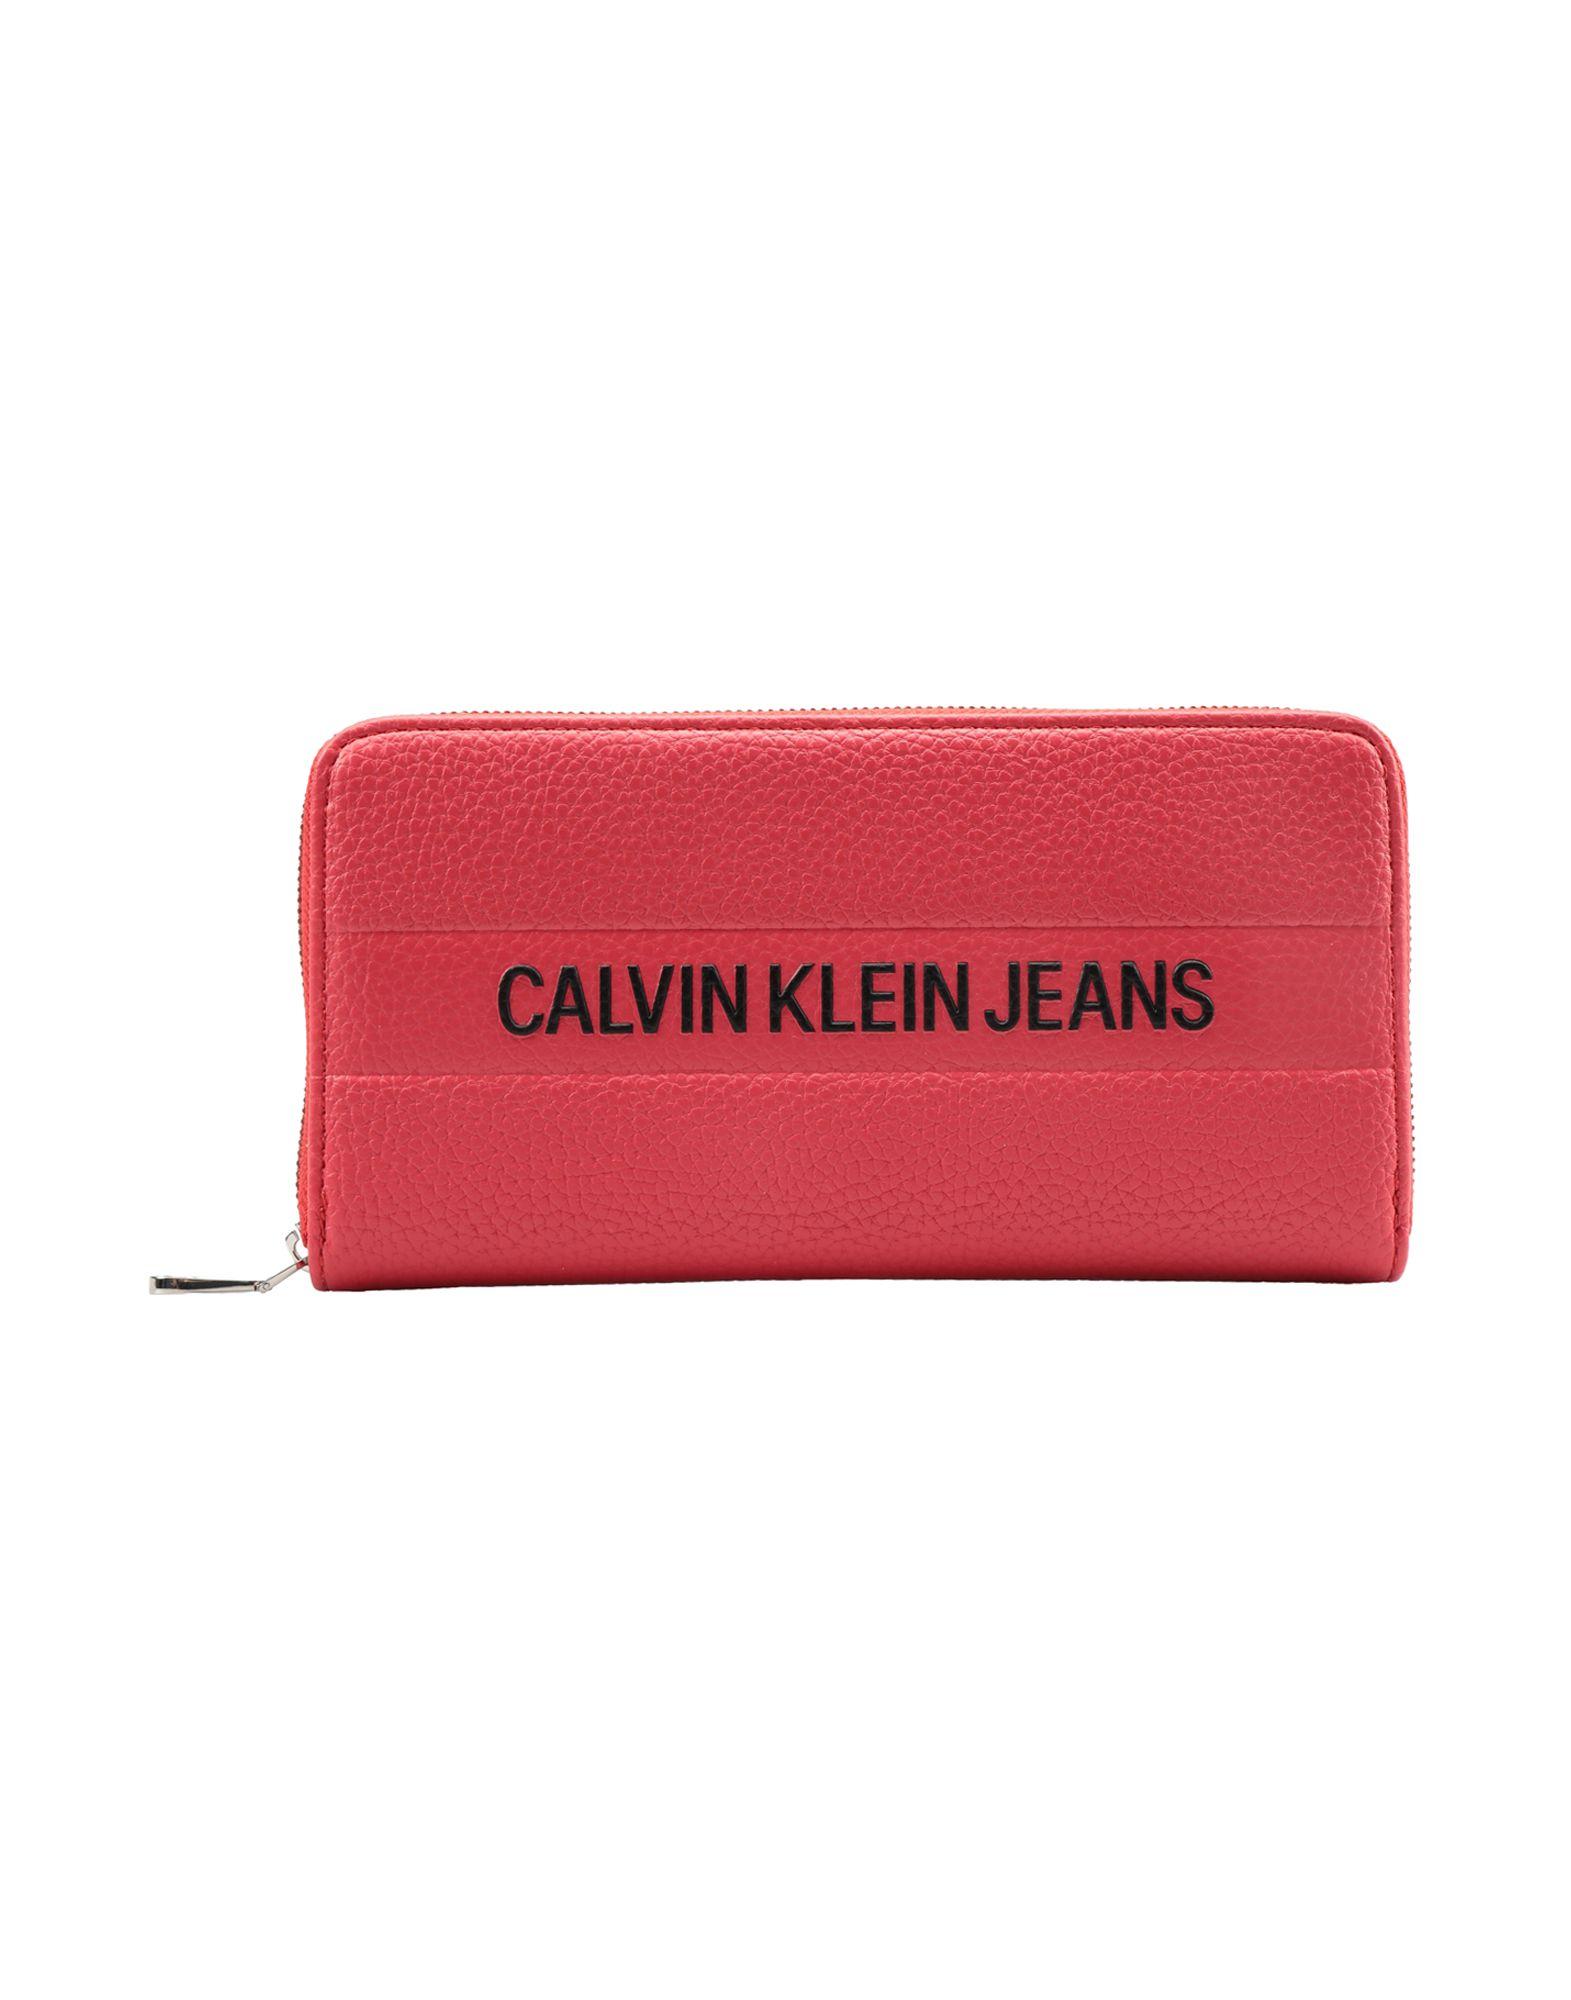 CALVIN KLEIN JEANS Бумажник цена и фото